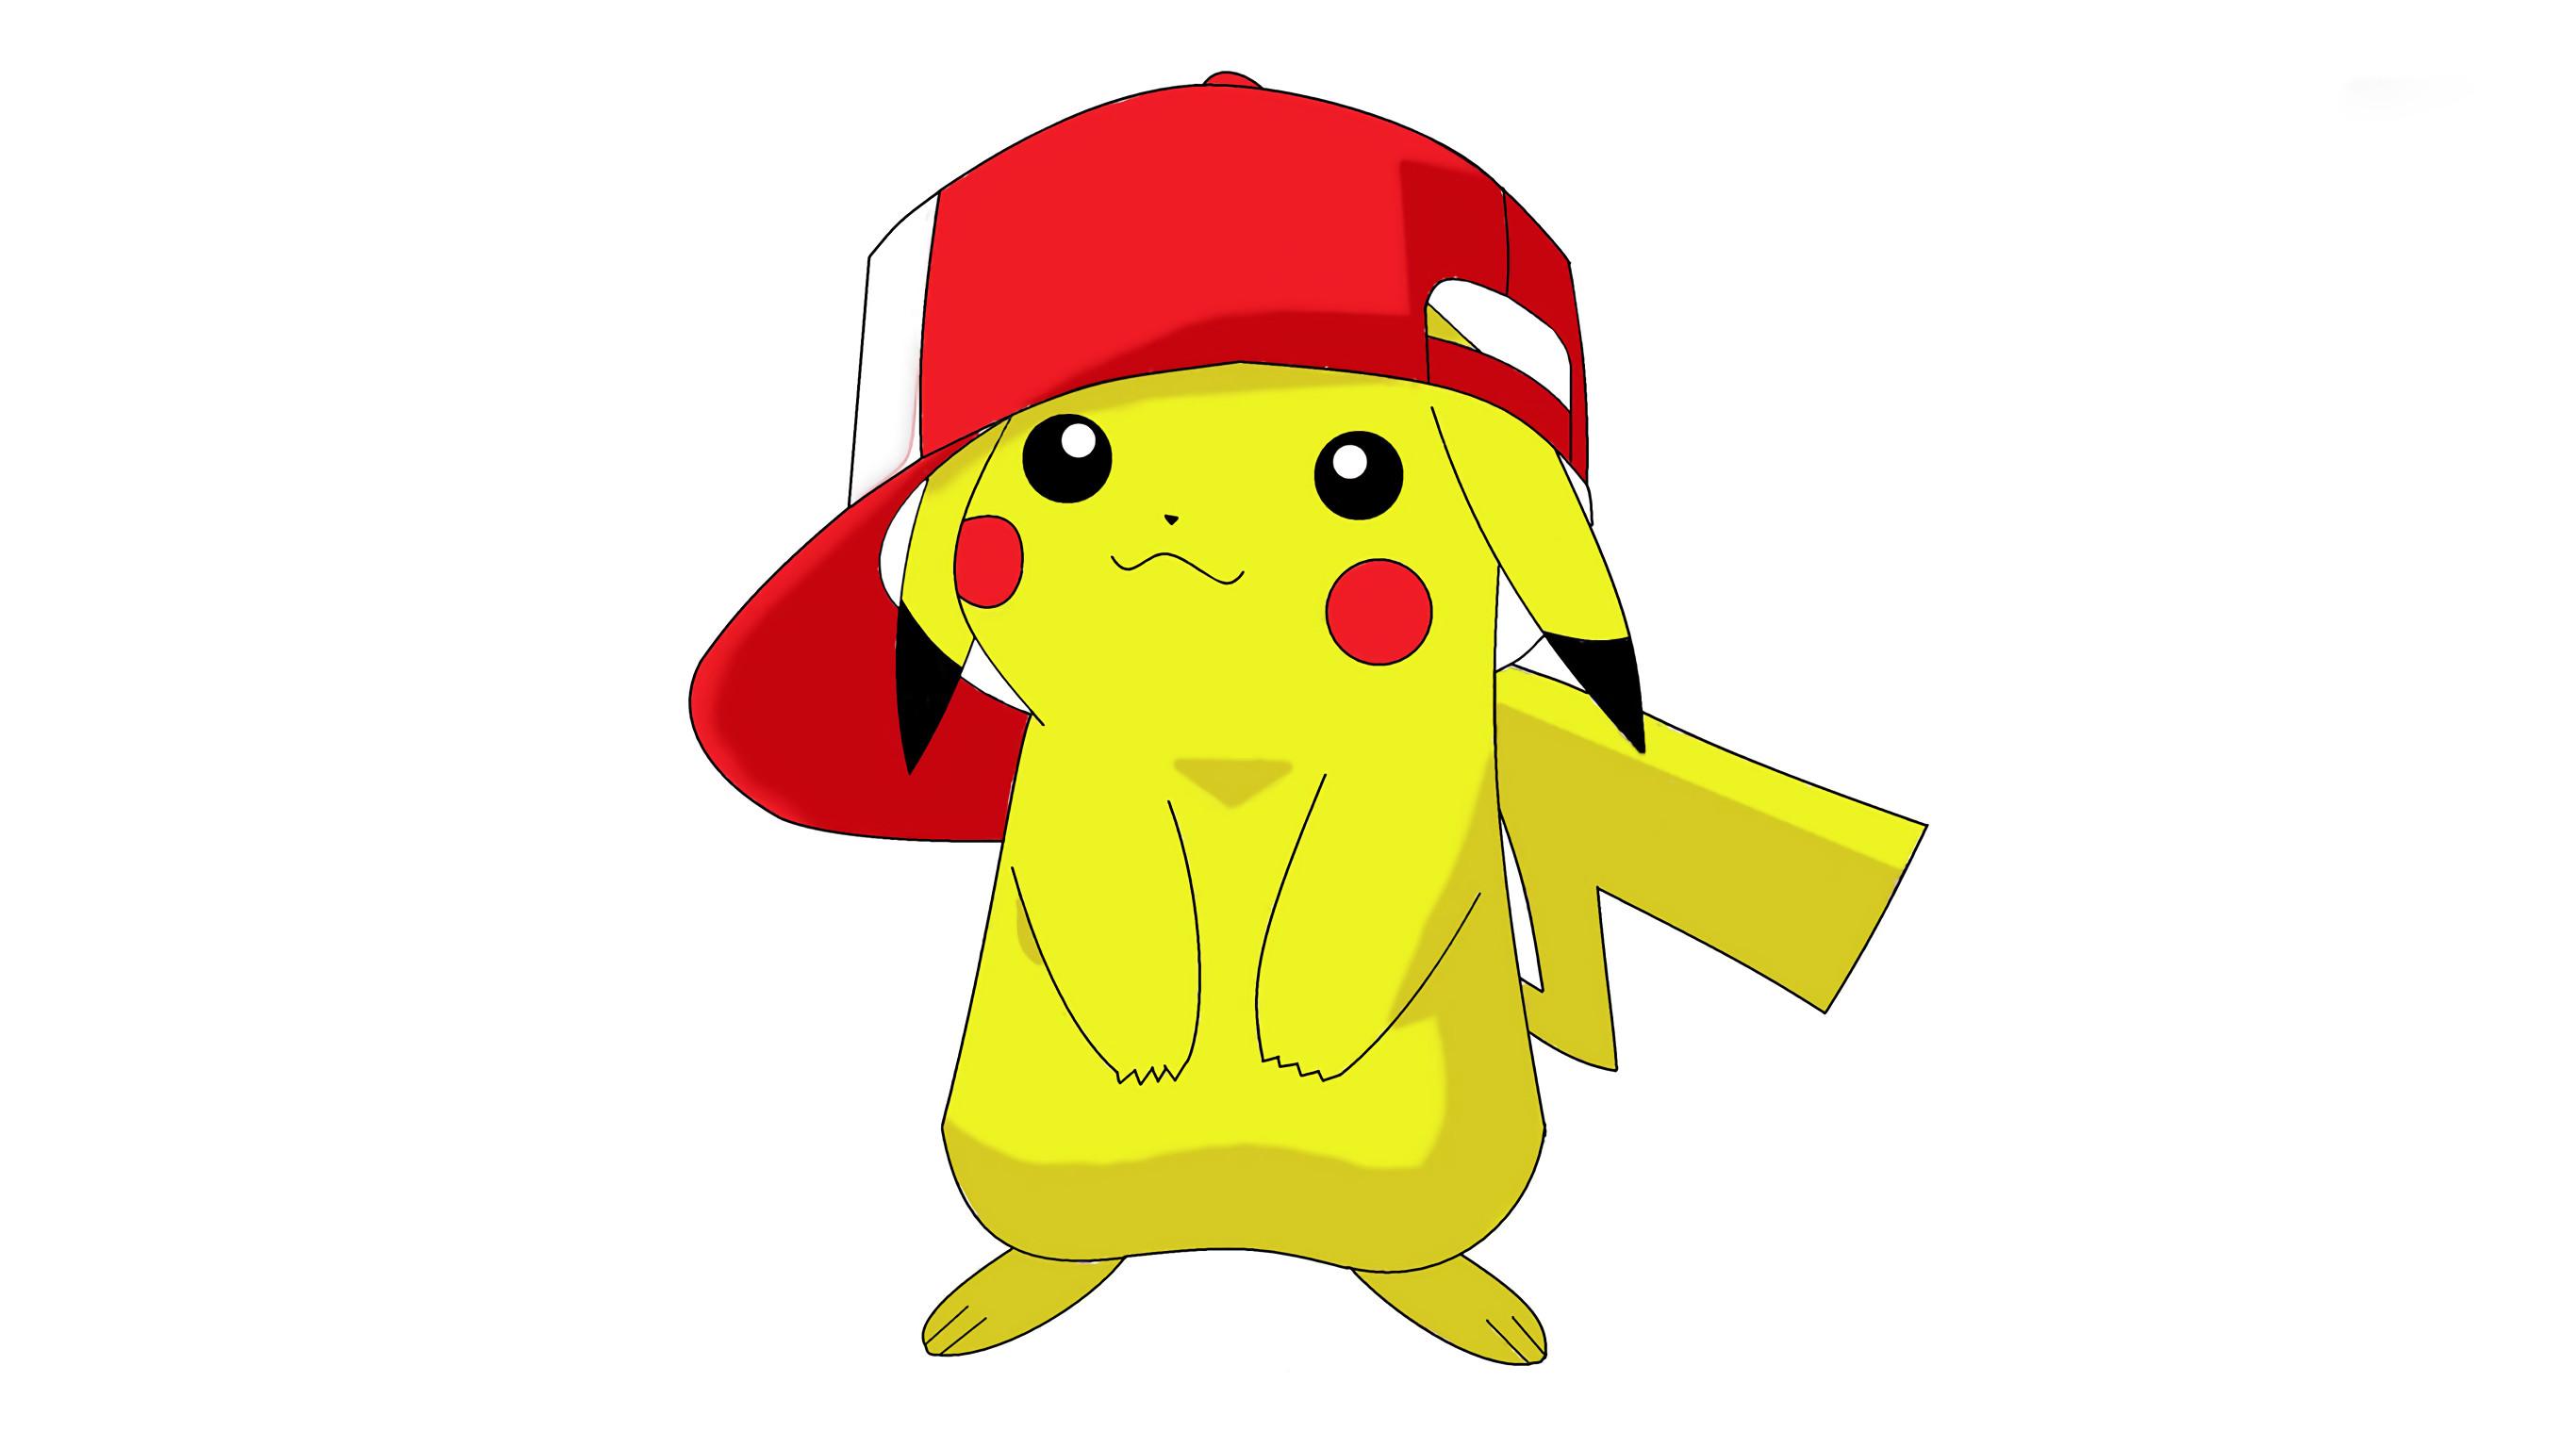 Res: 2732x1536, HD Wallpaper | Background Image ID:481903.  Anime Pokémon